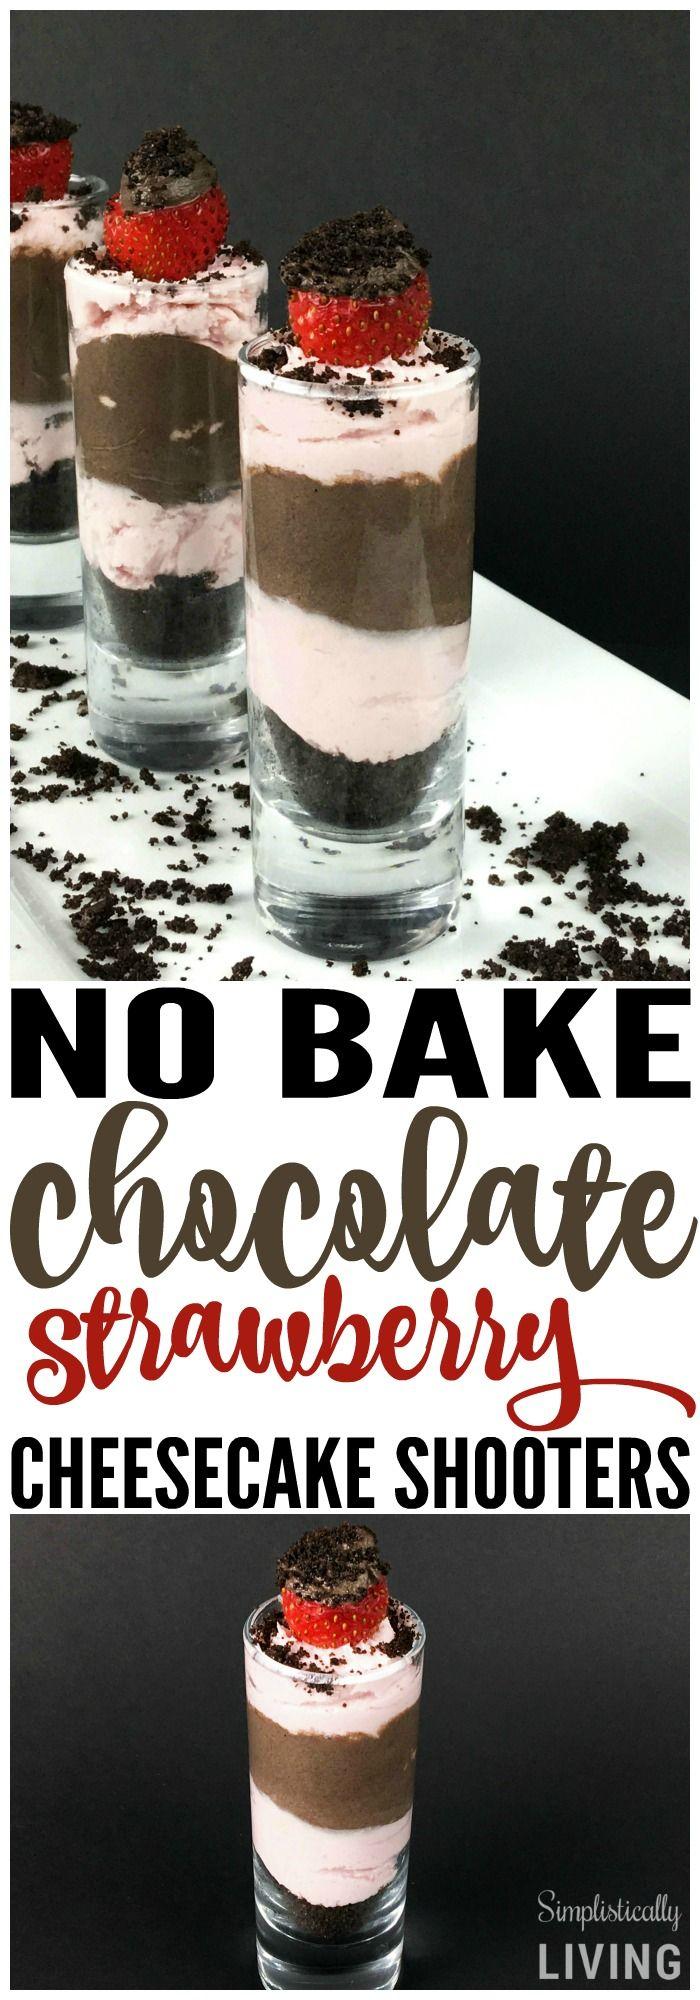 No Bake Chocolate Strawberry Cheesecake Shooters Simplistically Living